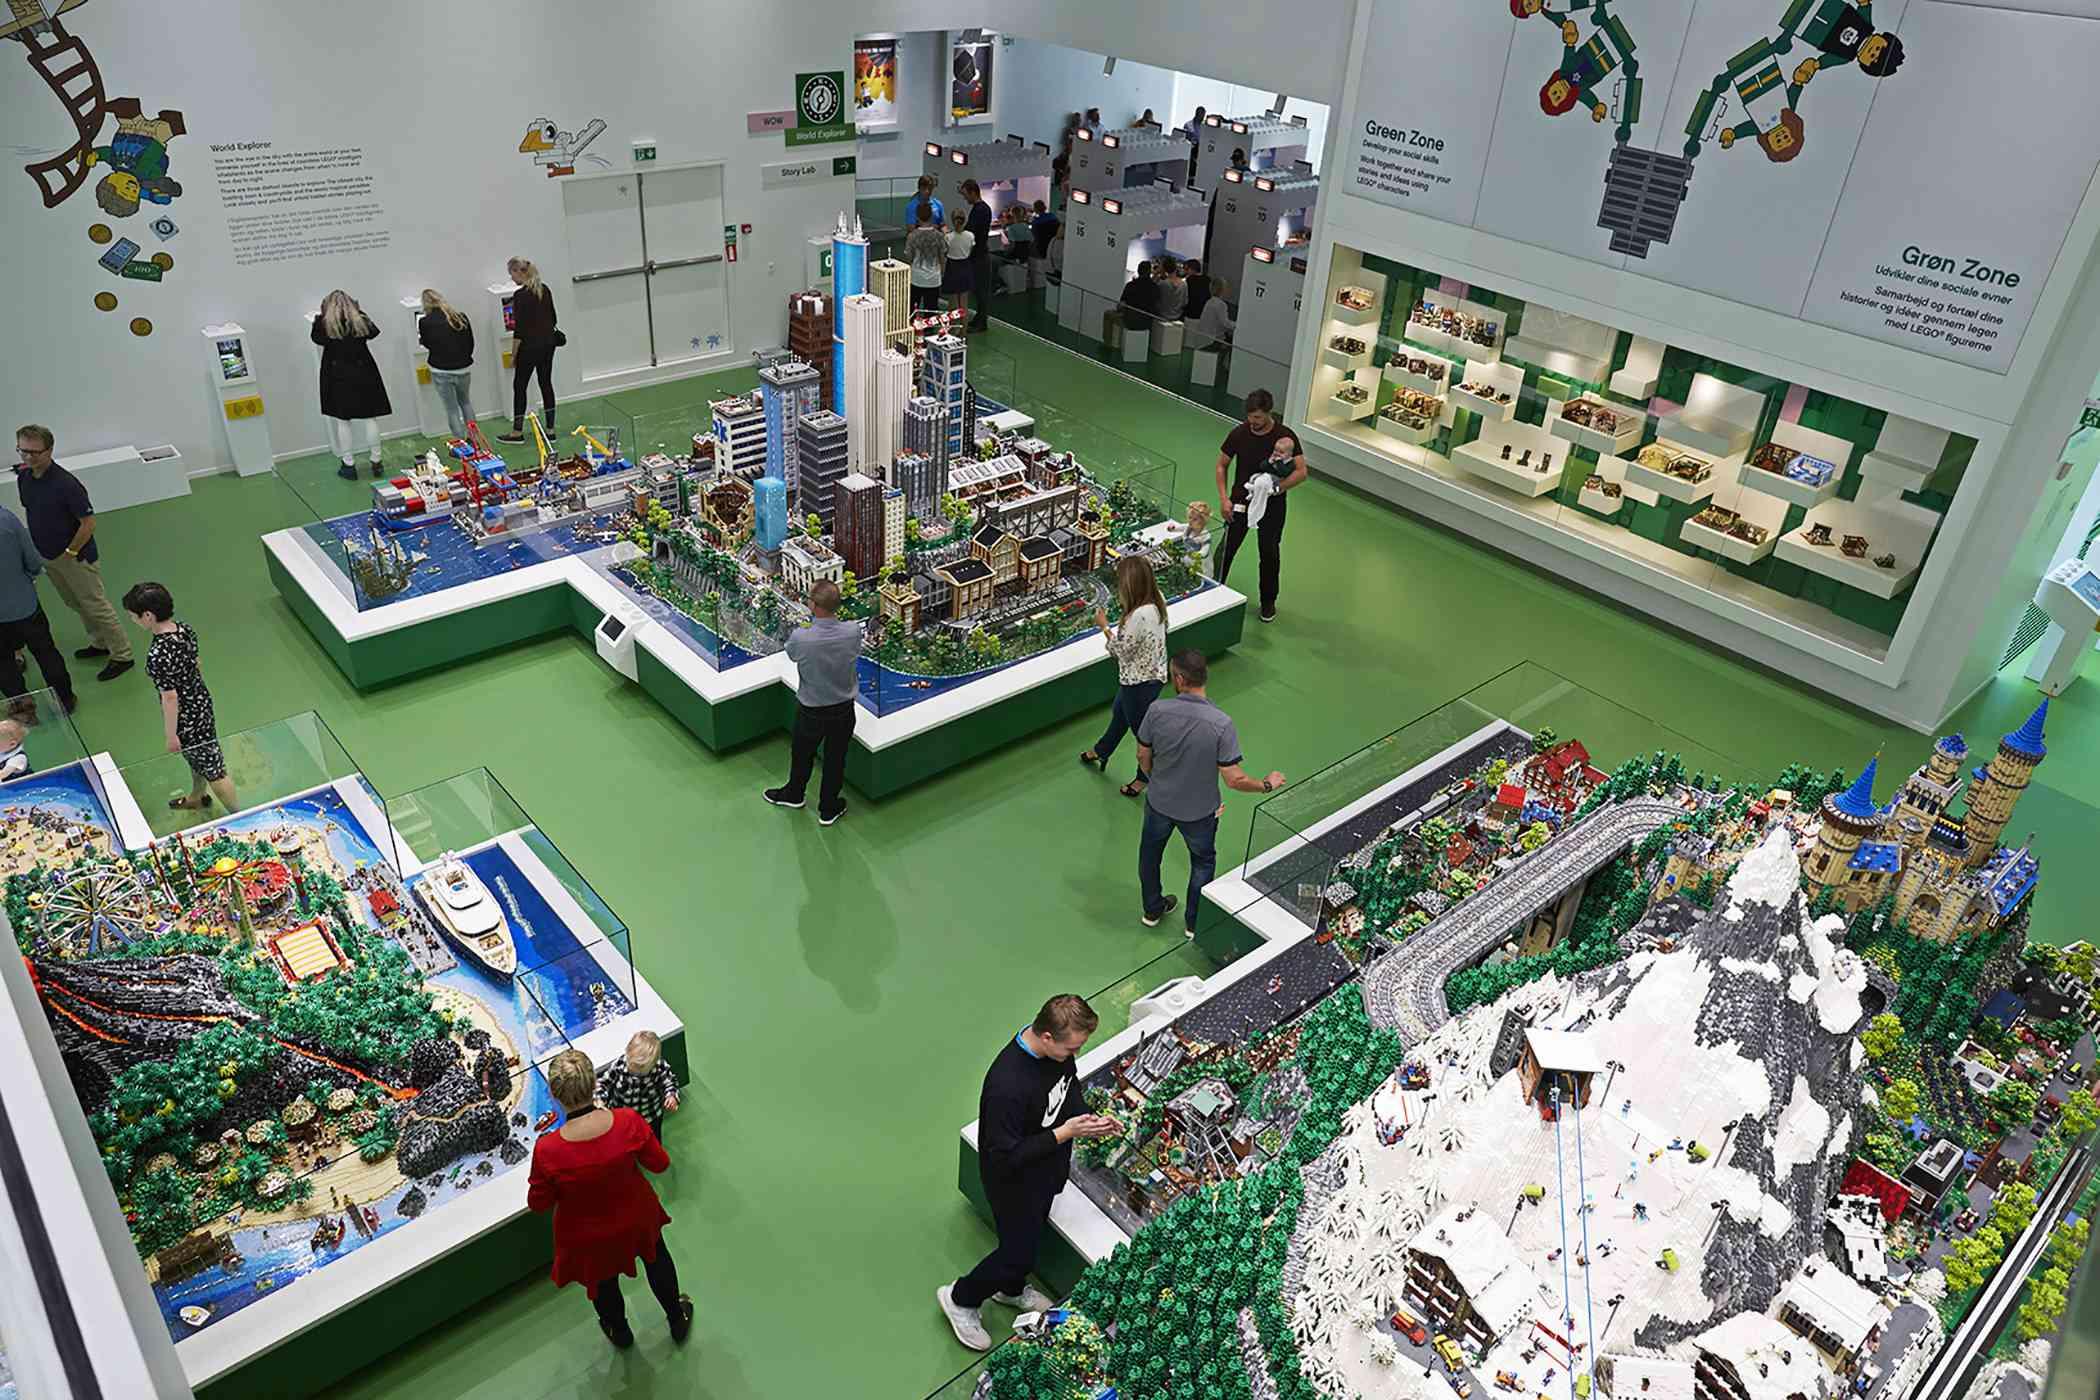 Green Zone at Lego House, Billund, Denmark